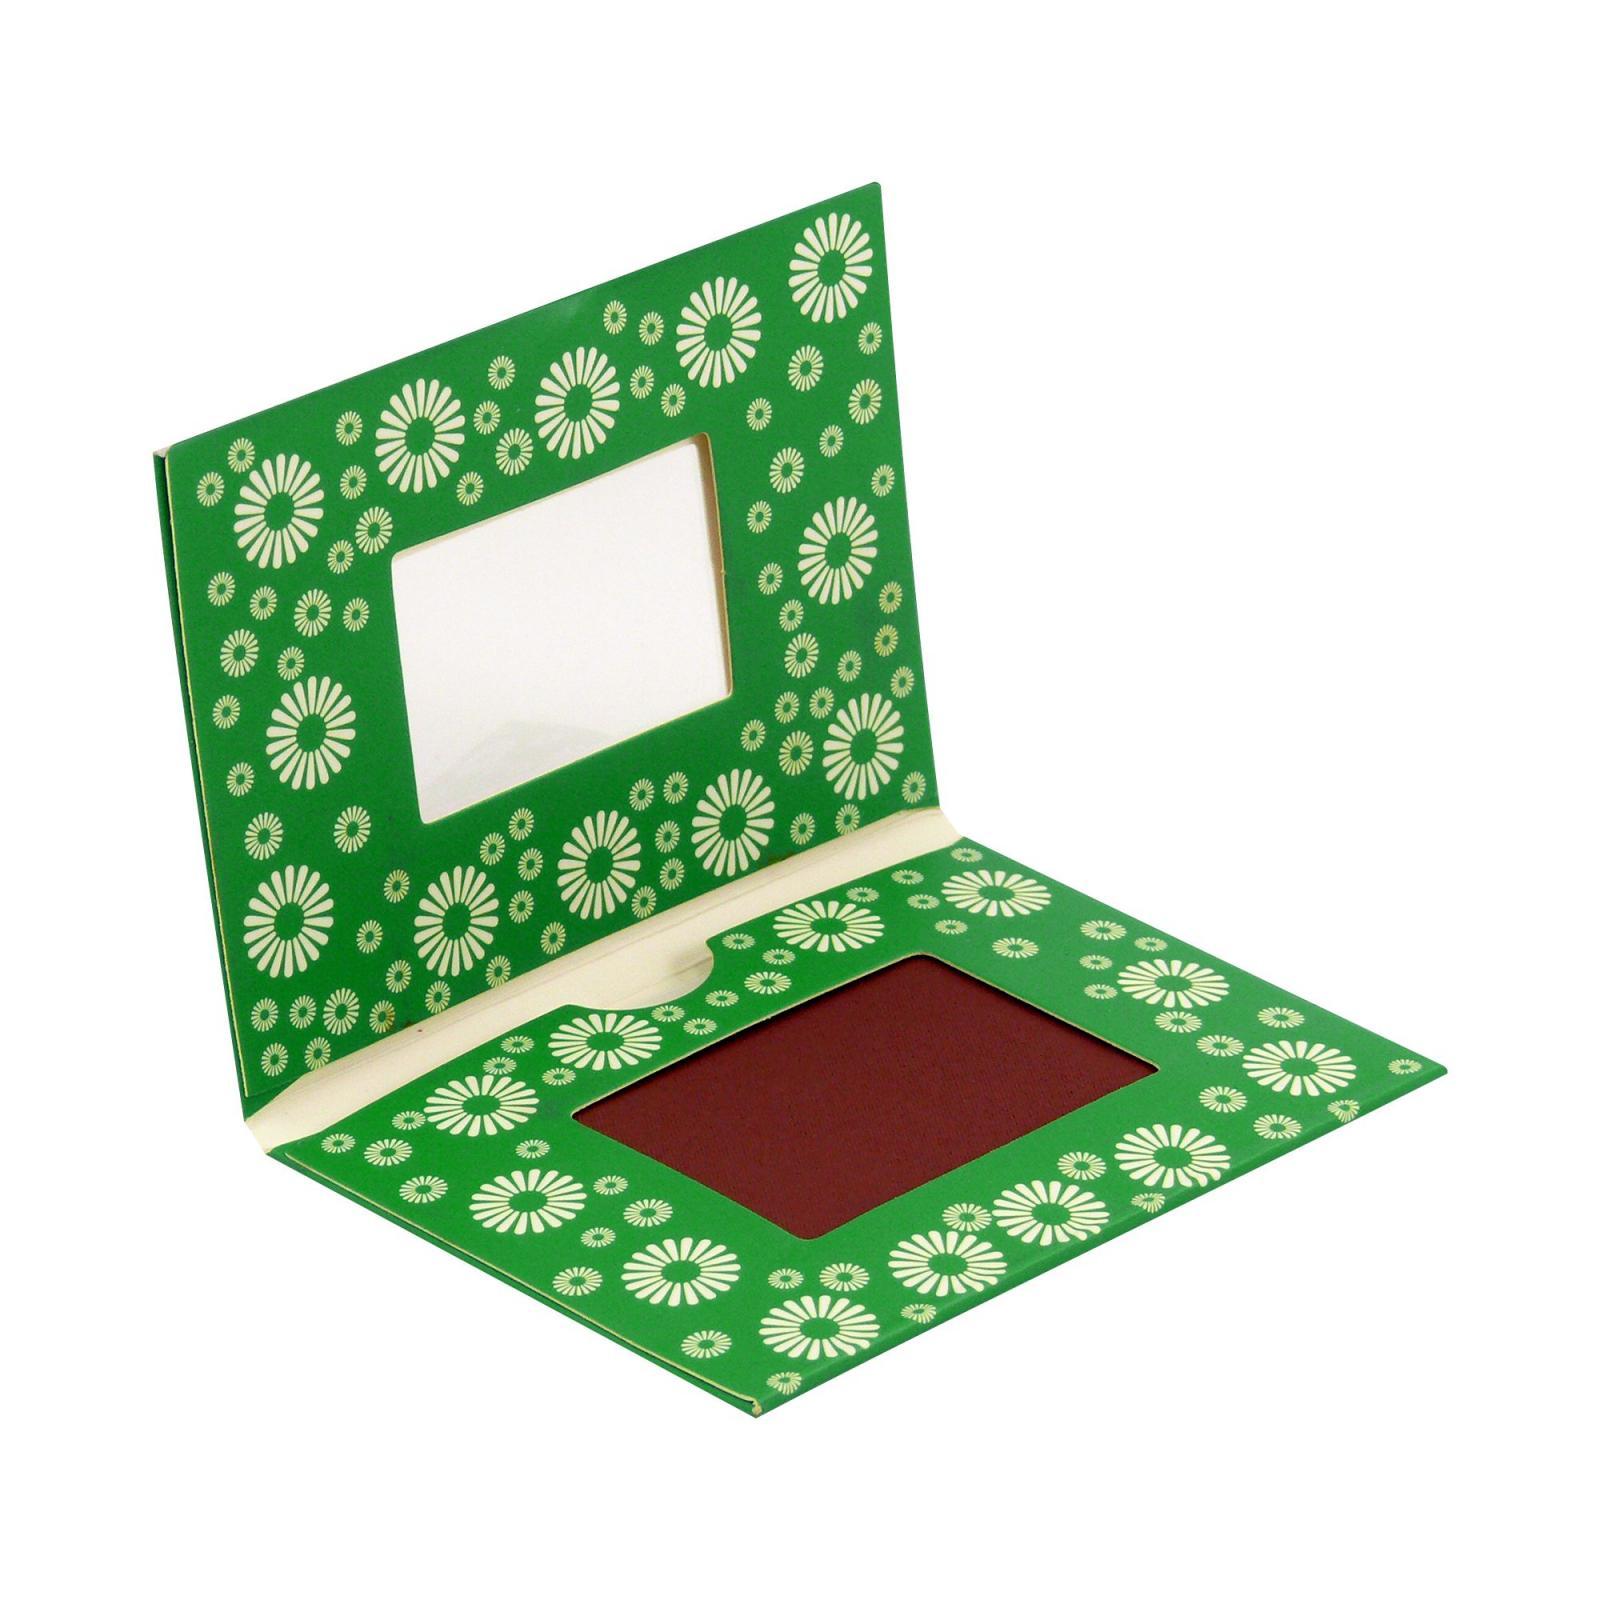 Cosm´etika Kompaktní bronzer 280 Brown Bronze 6 g